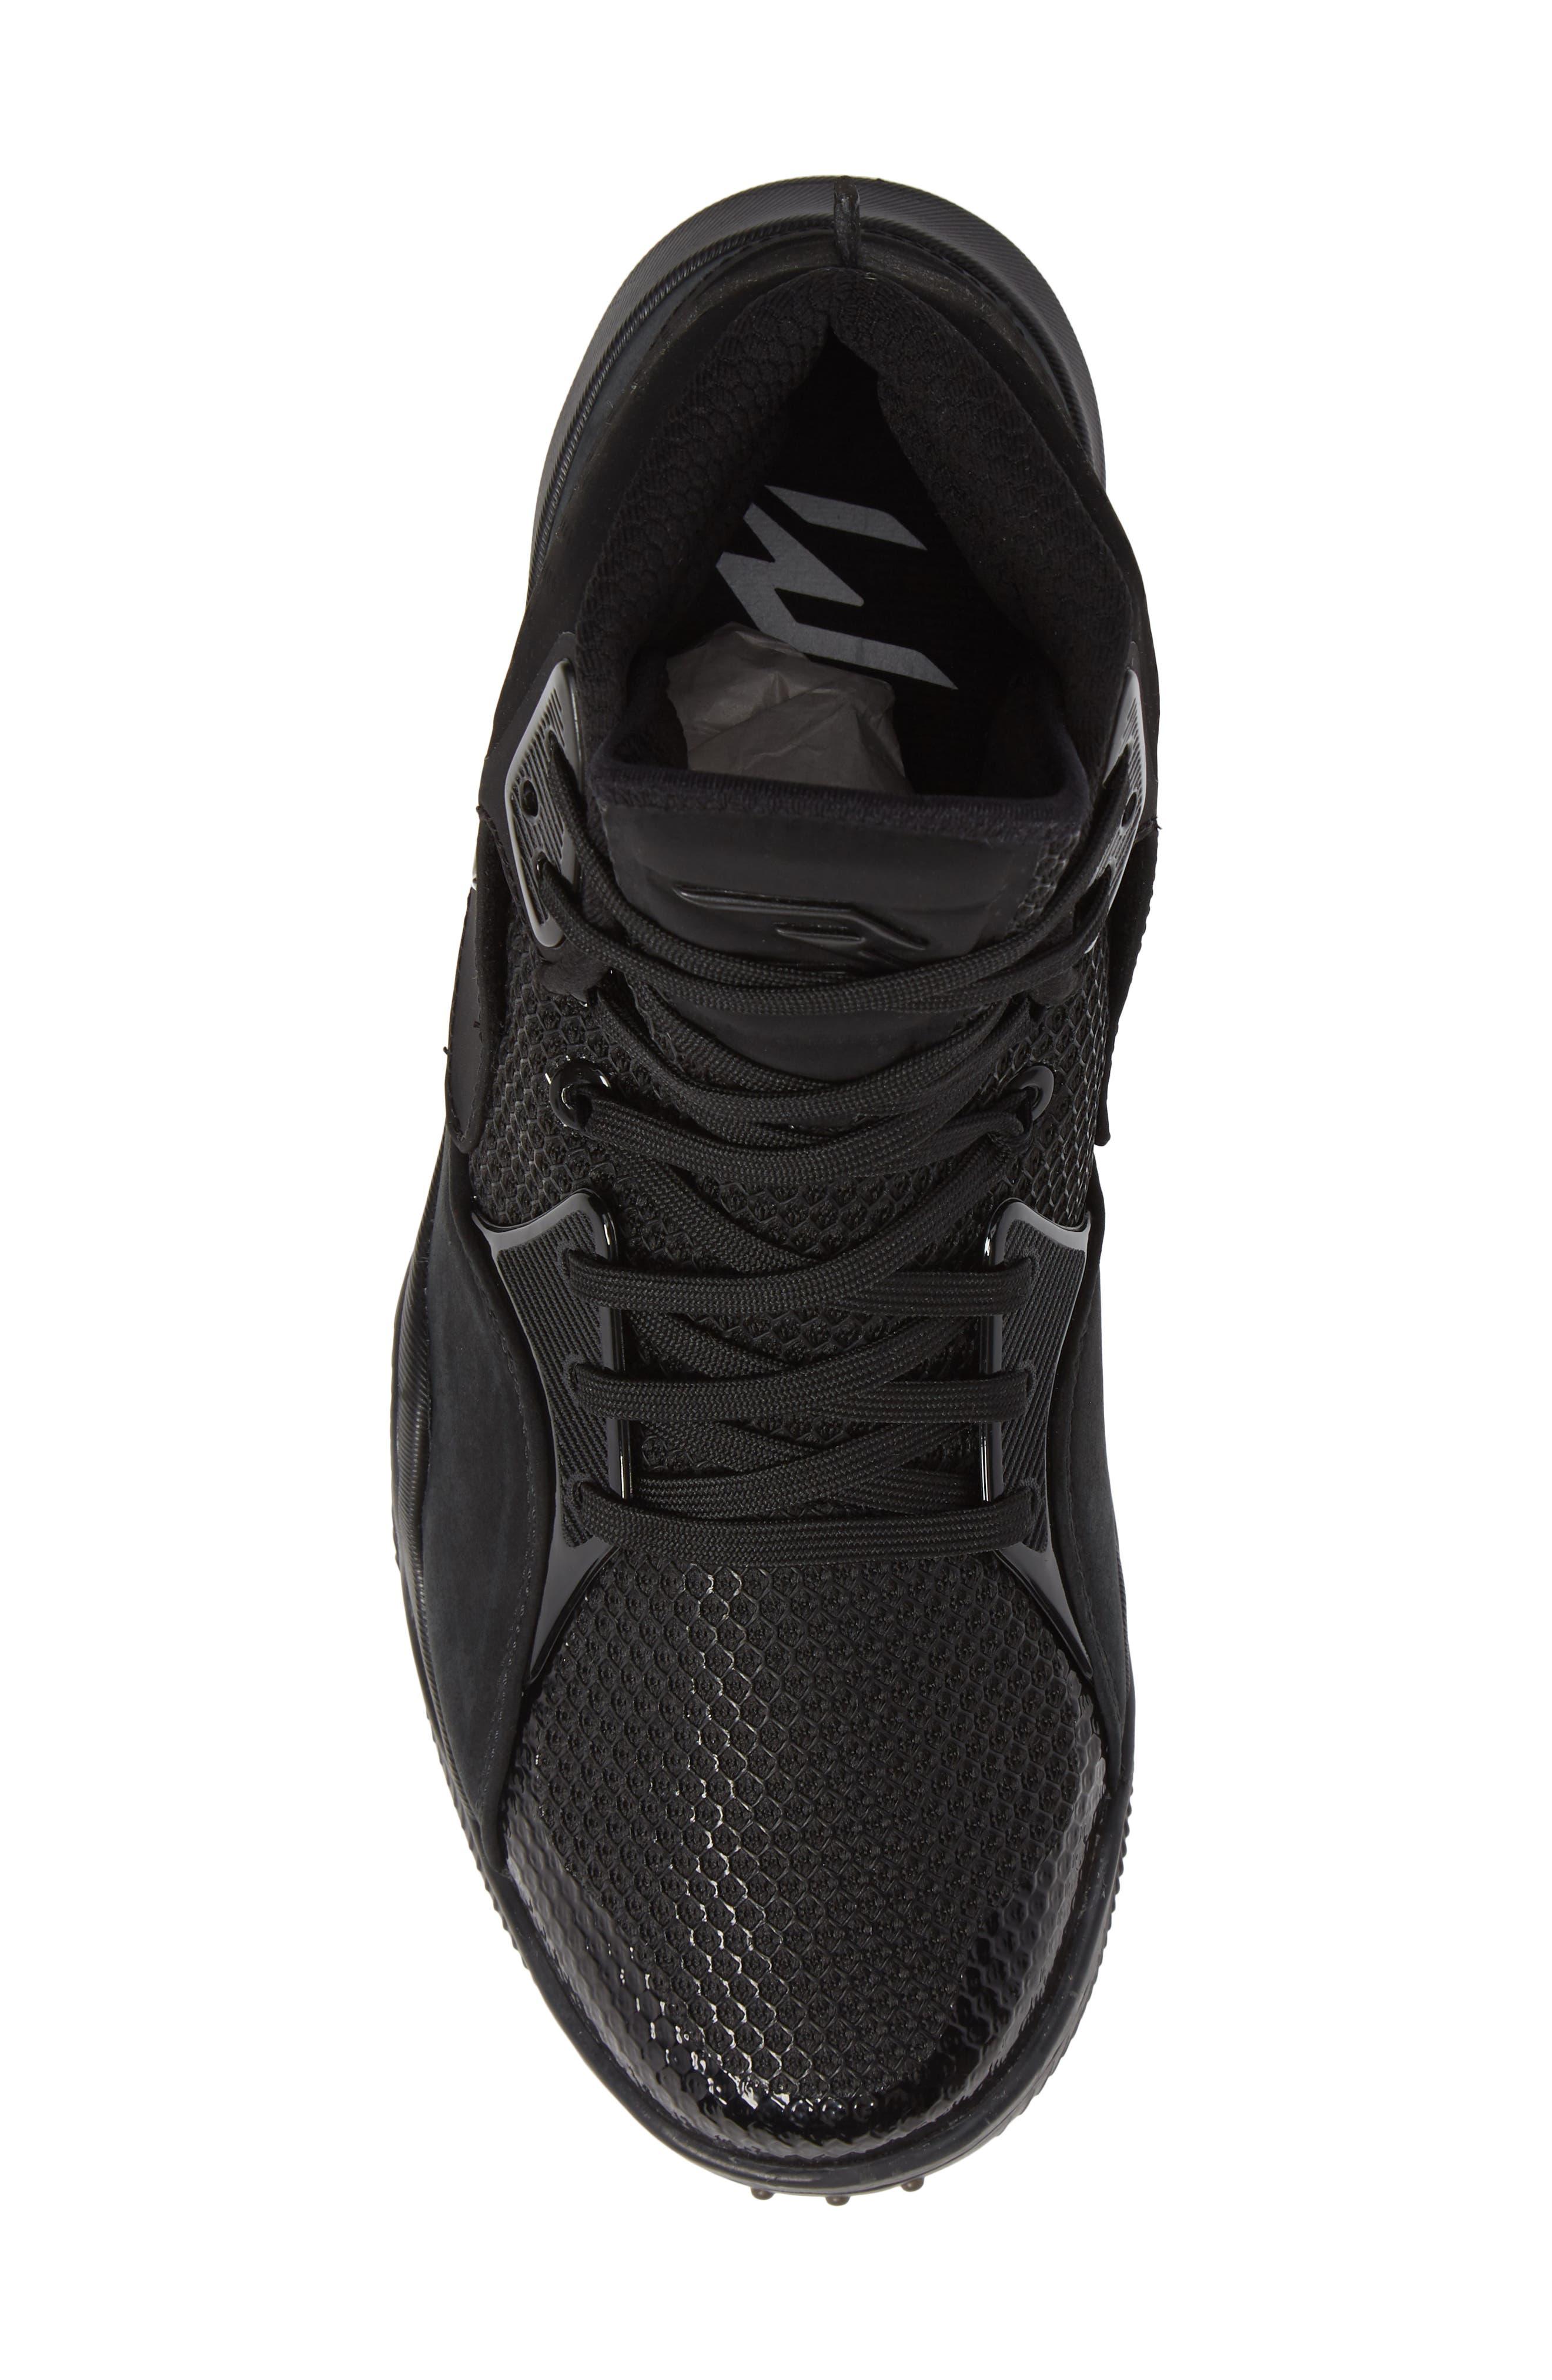 Dangeruss Wilson 1 Sneaker,                             Alternate thumbnail 5, color,                             BLACK/ METALLIC GOLD